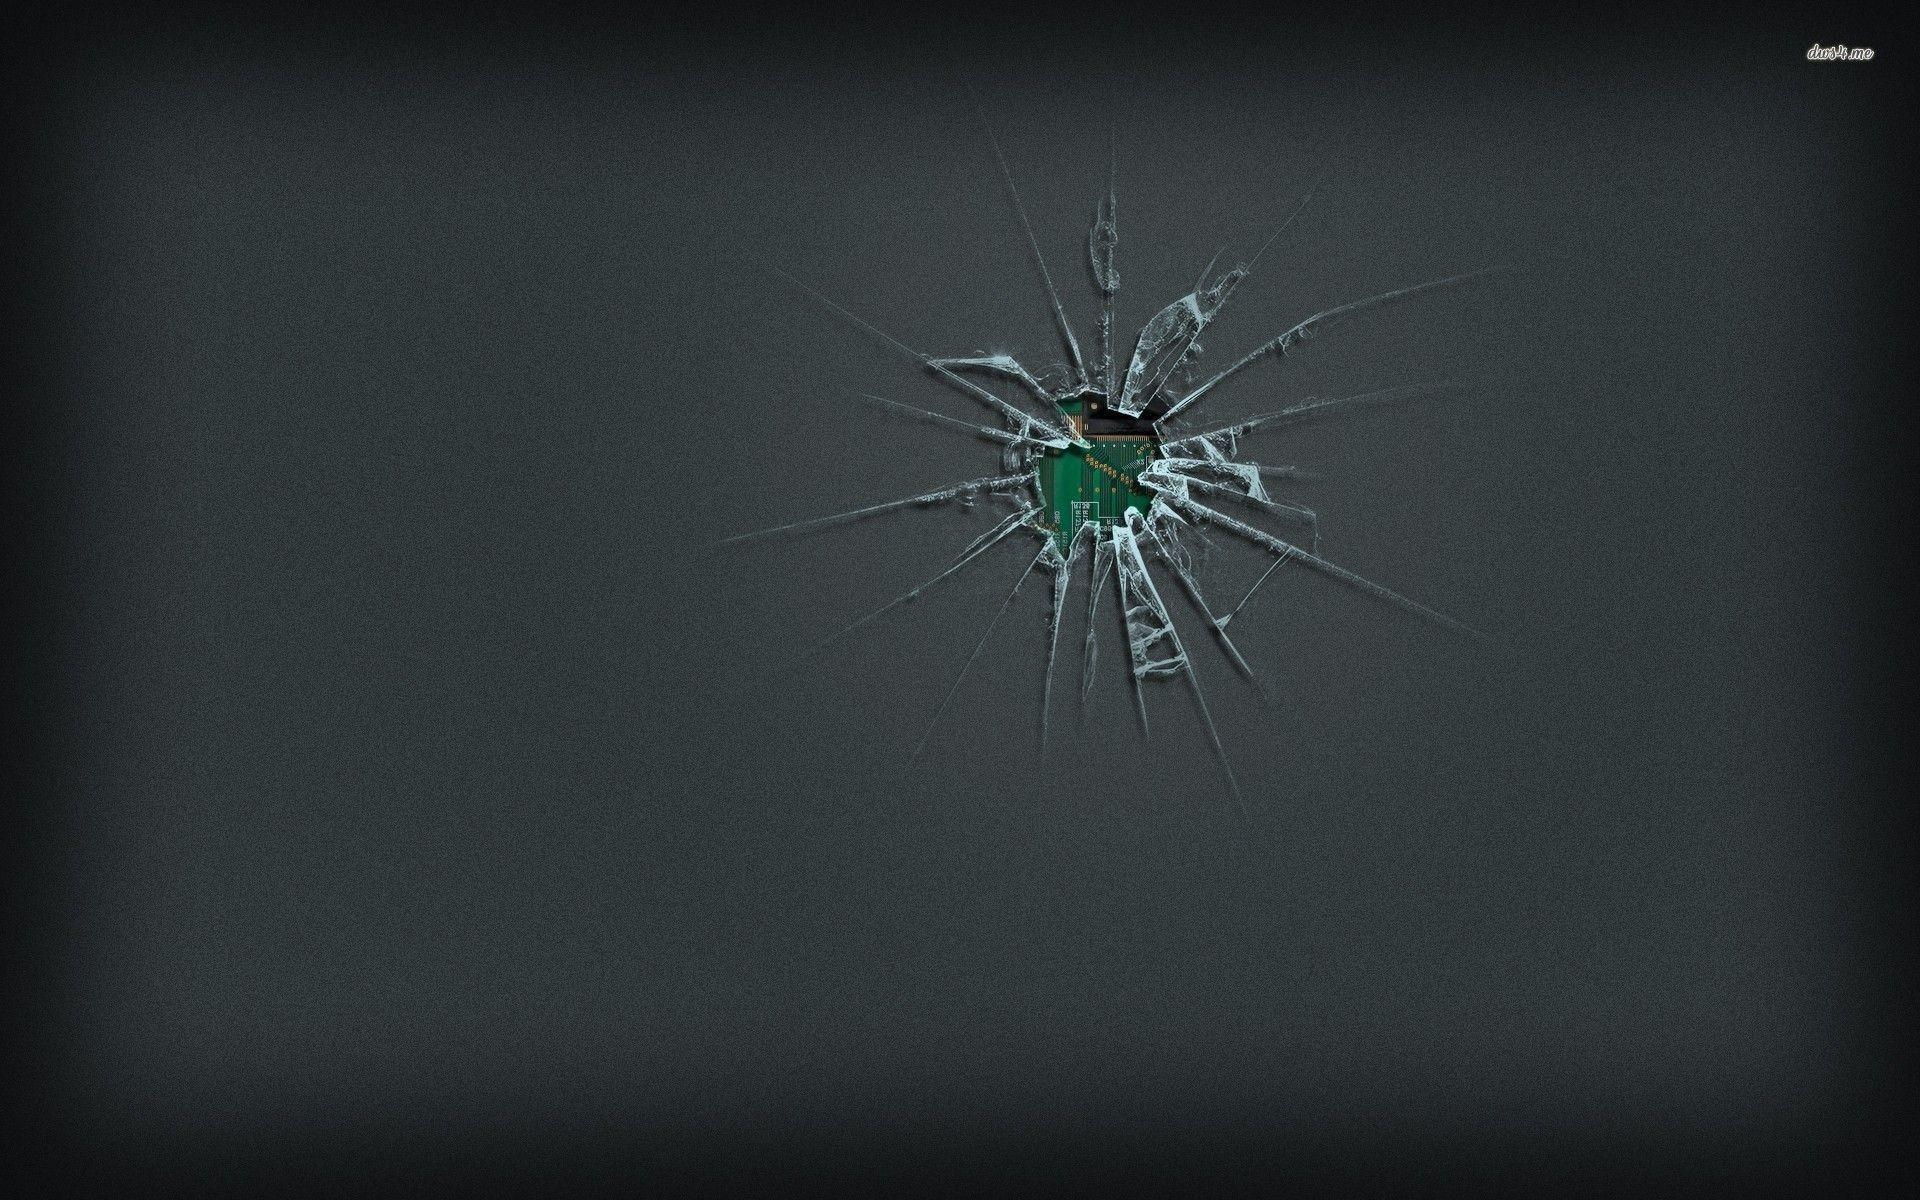 guitar wallpaper behind glass - photo #4